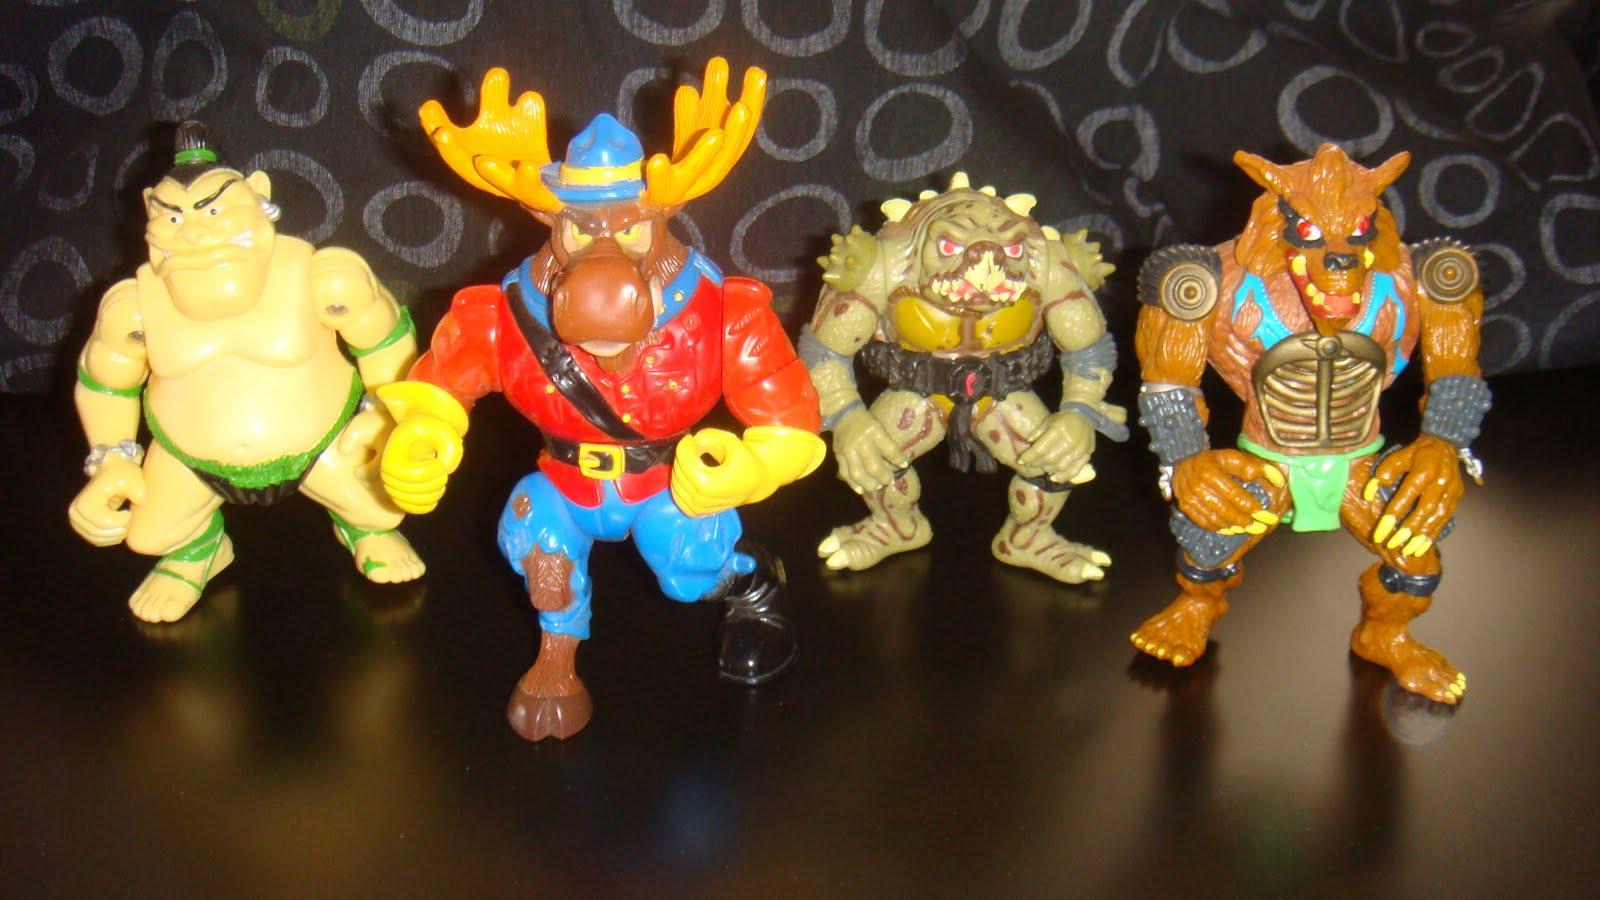 2810a7a93b Freak Studios: How mutant can you get?